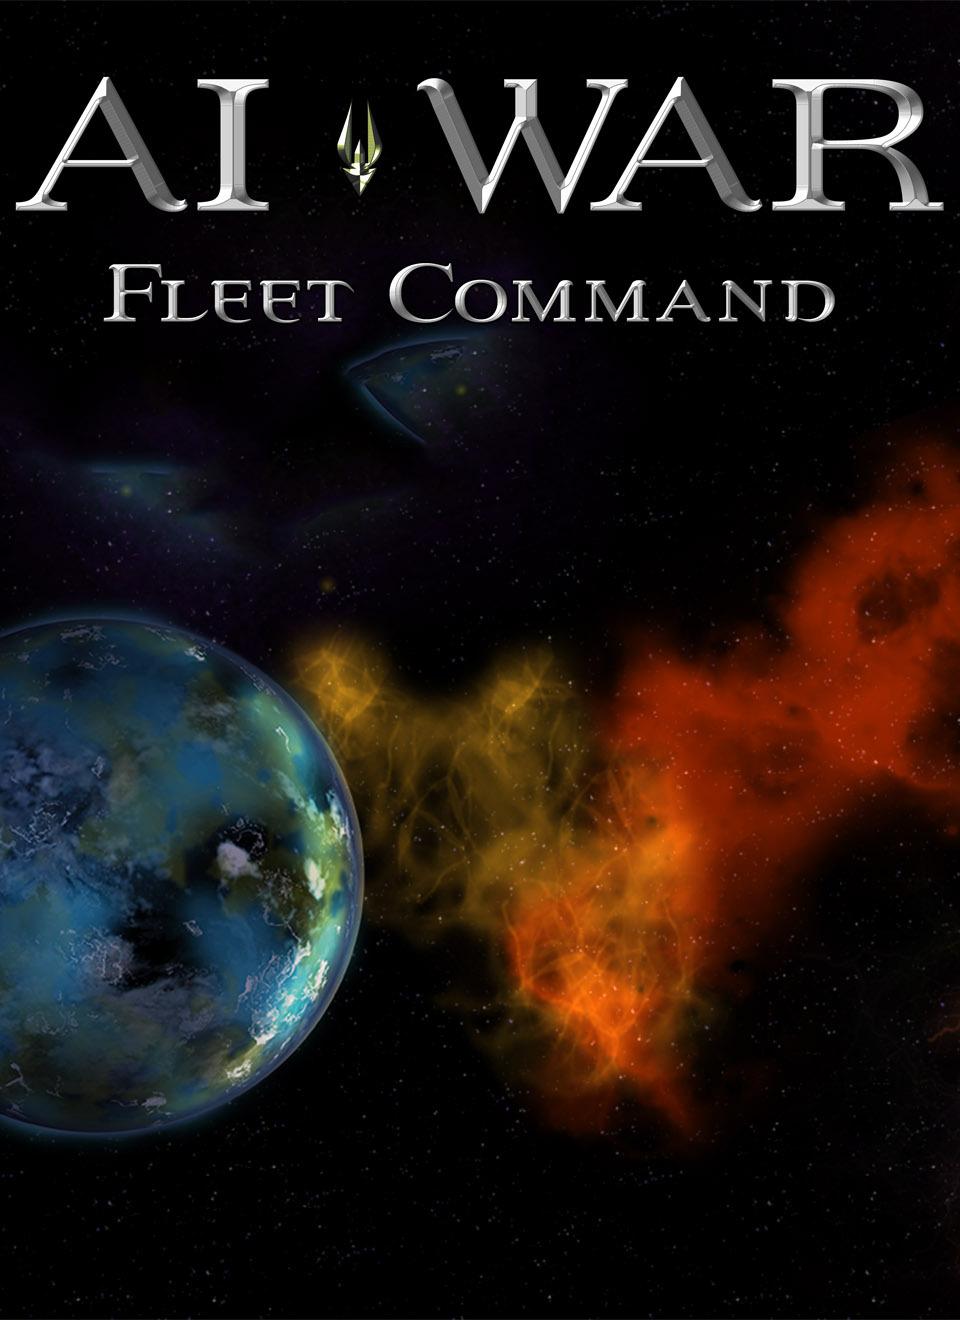 Ai War ai war: fleet command (video game) - tv tropes